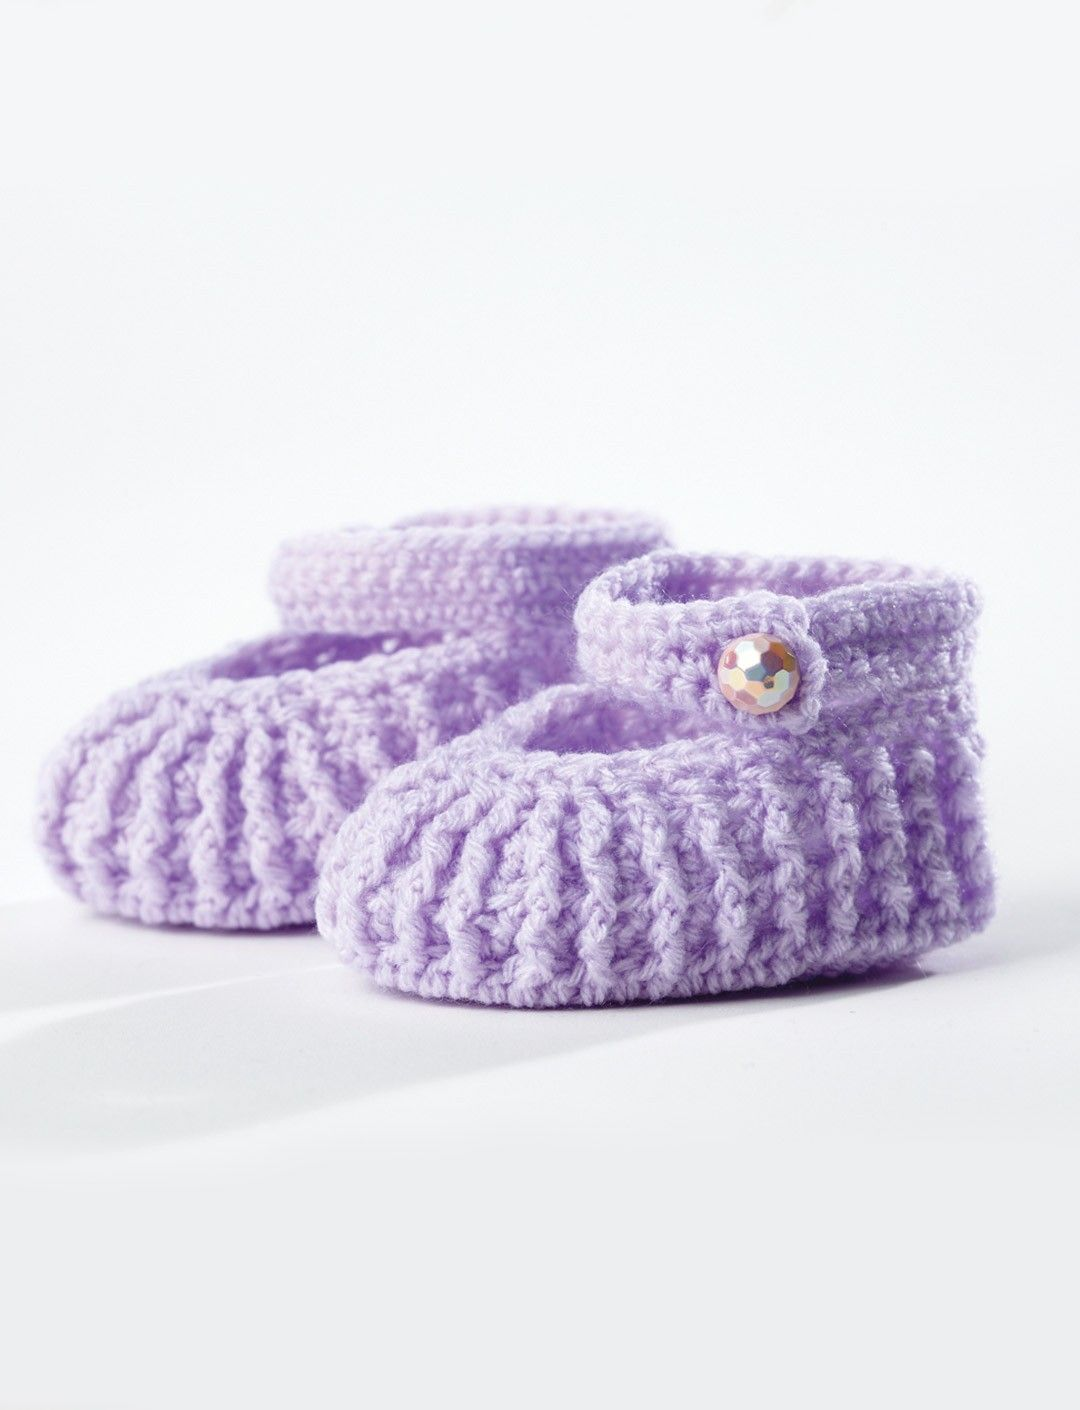 Yarnspirations.com - Bernat Crochet Booties | Yarnspirations | Bebes ...